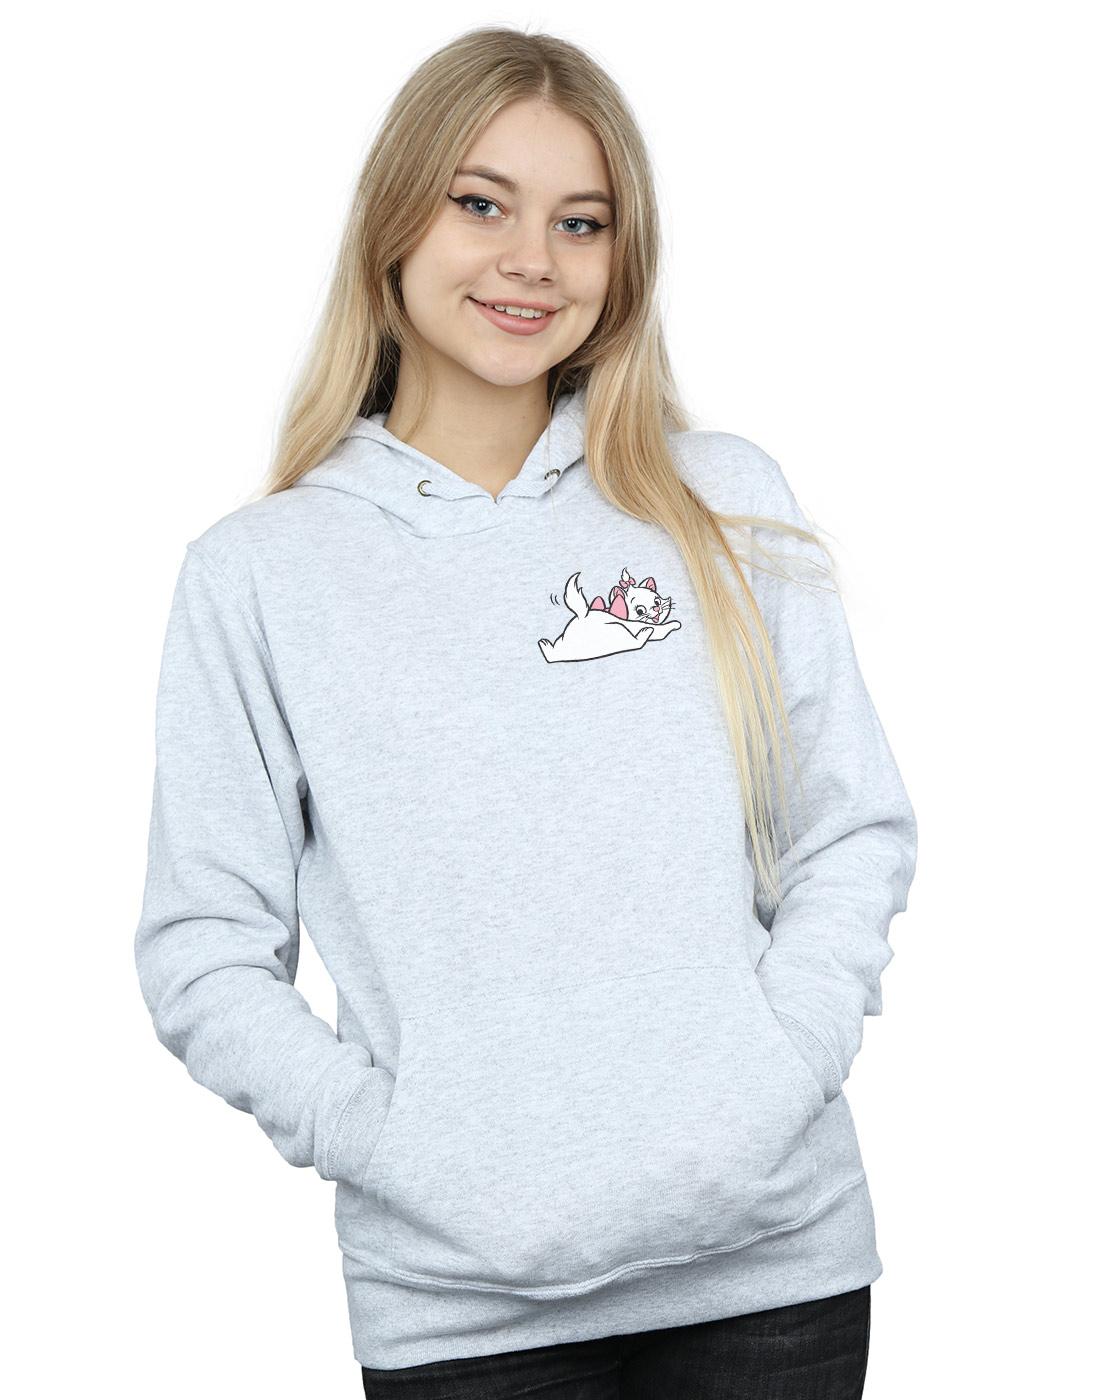 New DISNEY ARISTOCAT MARIE Ladies JUMPER T-Shirt Sweatshirt Women/'s Primark BNWT